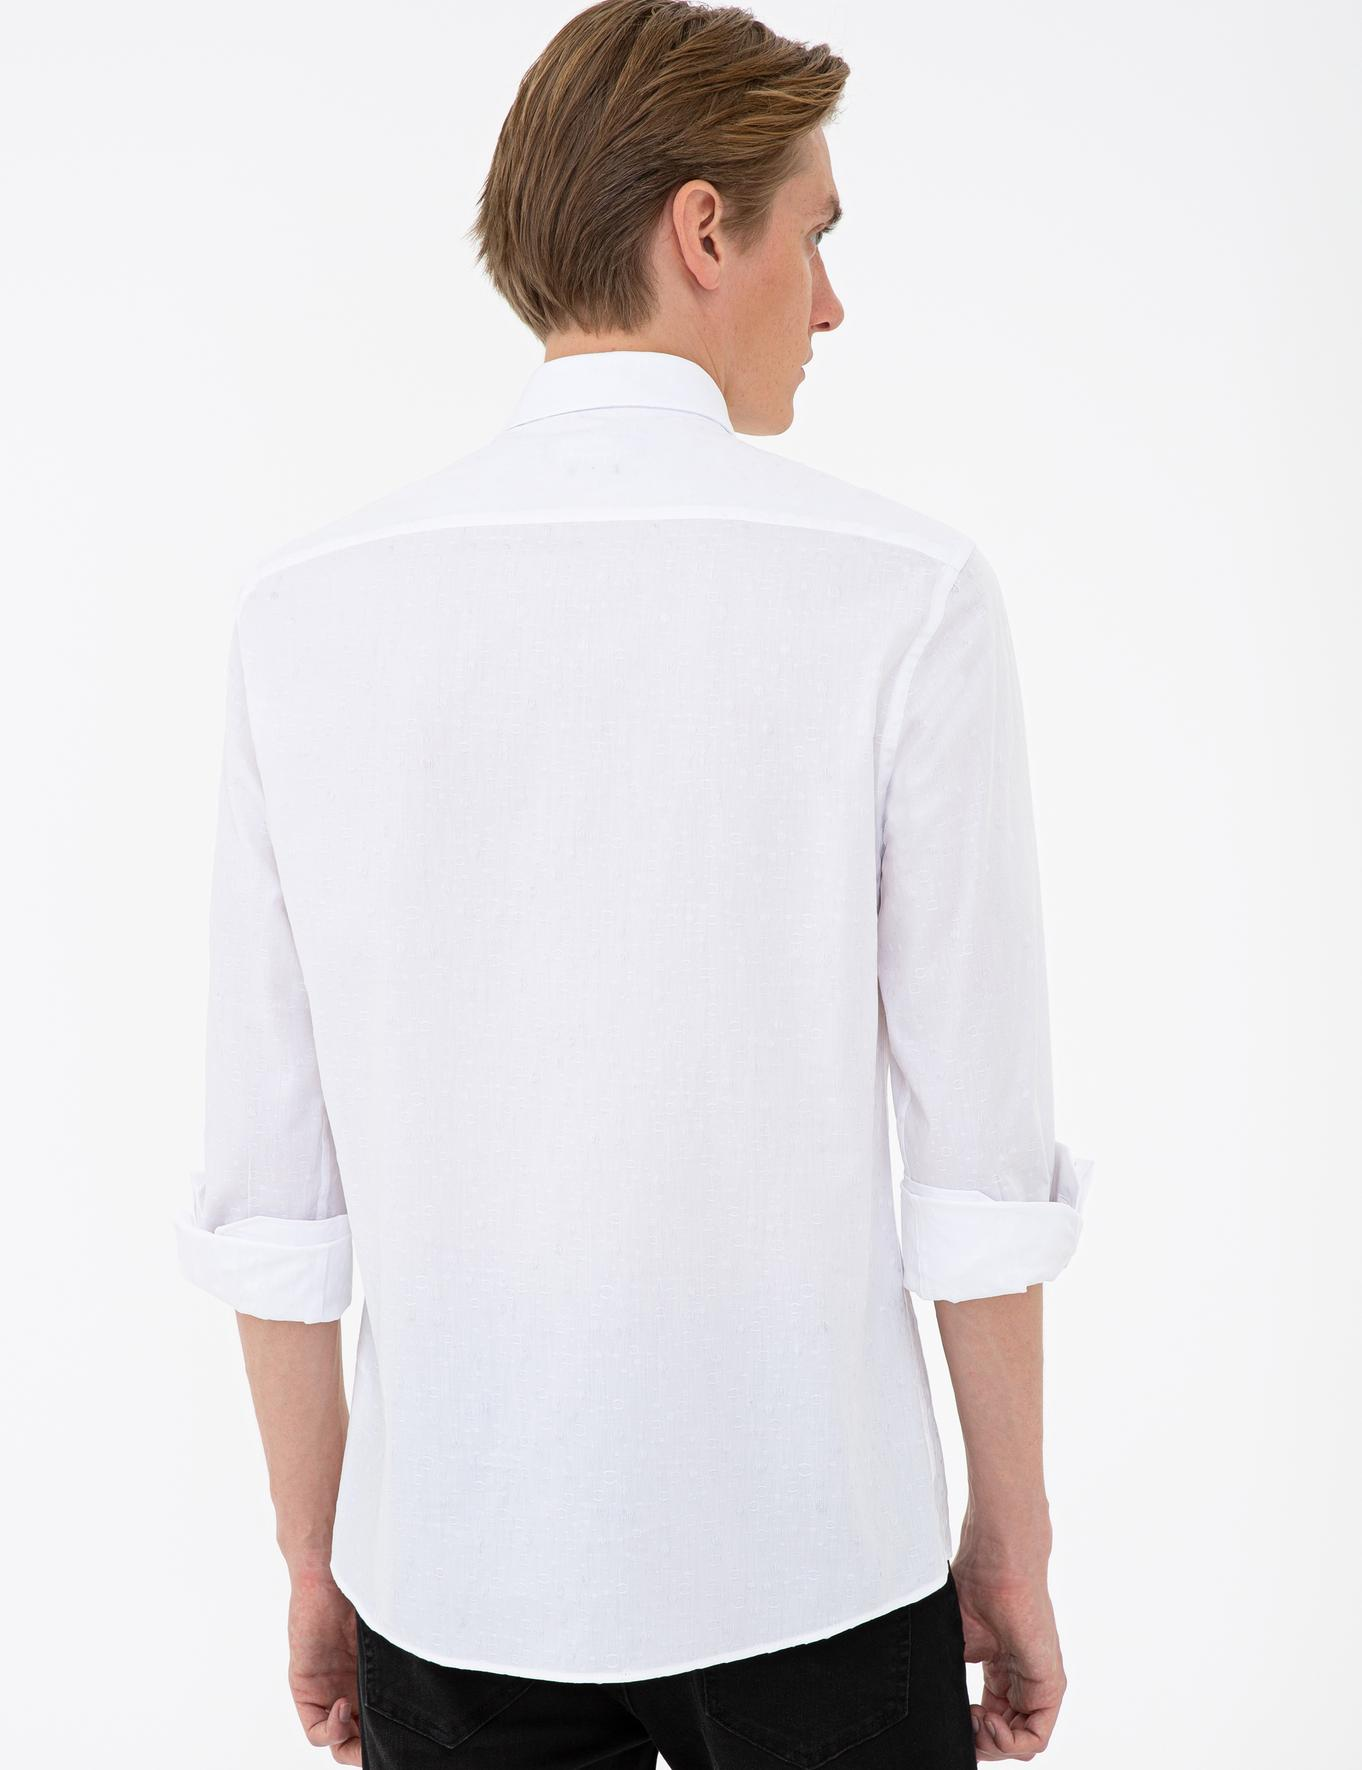 Beyaz Slim Fit Gömlek - 50233011026